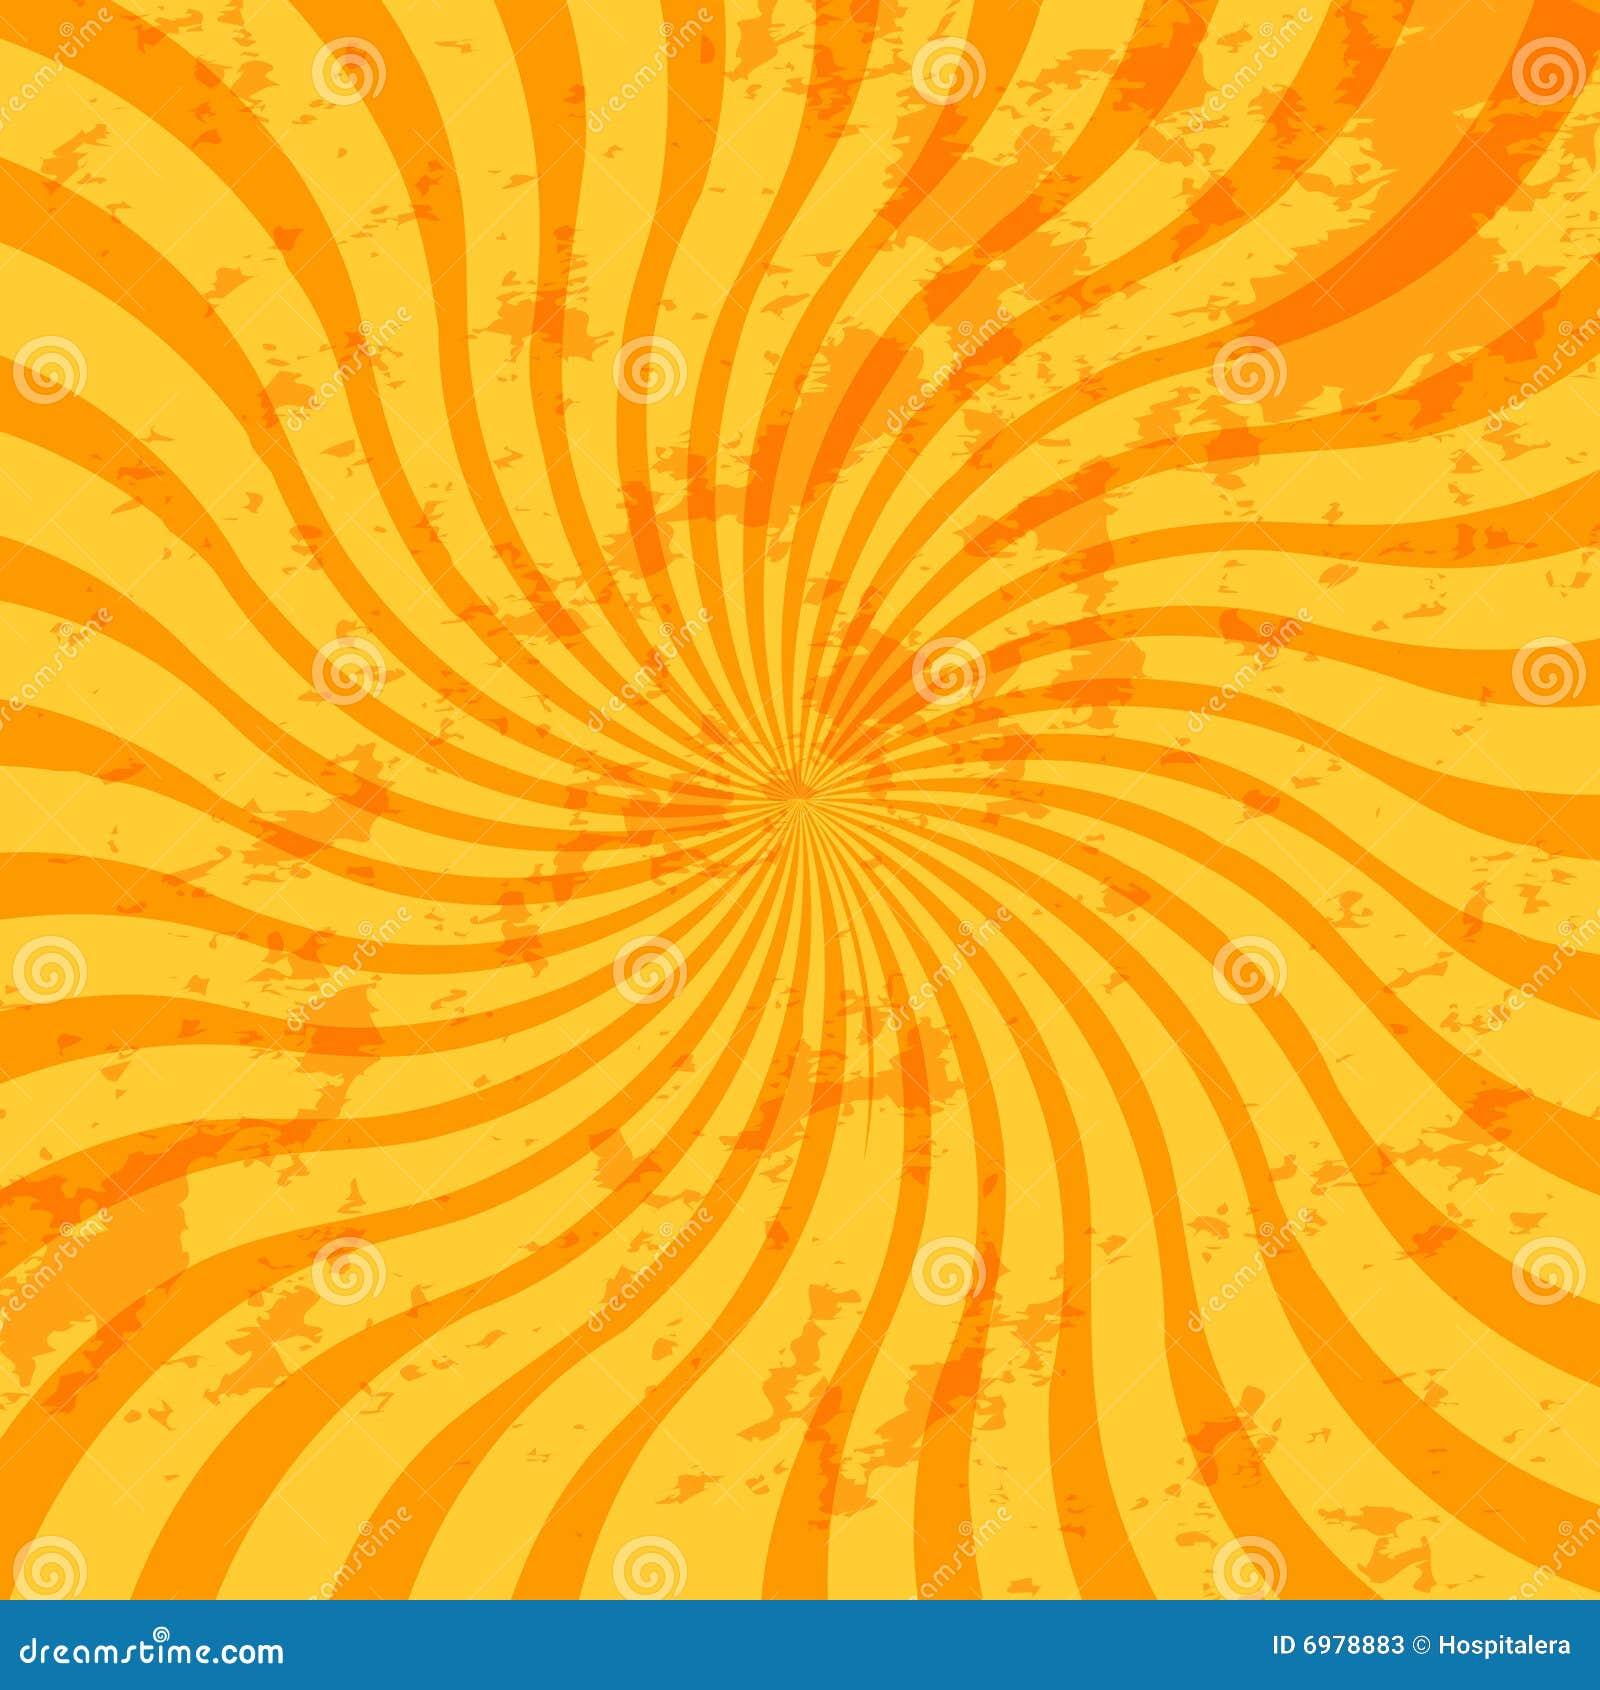 Sunburst Swirl Vector